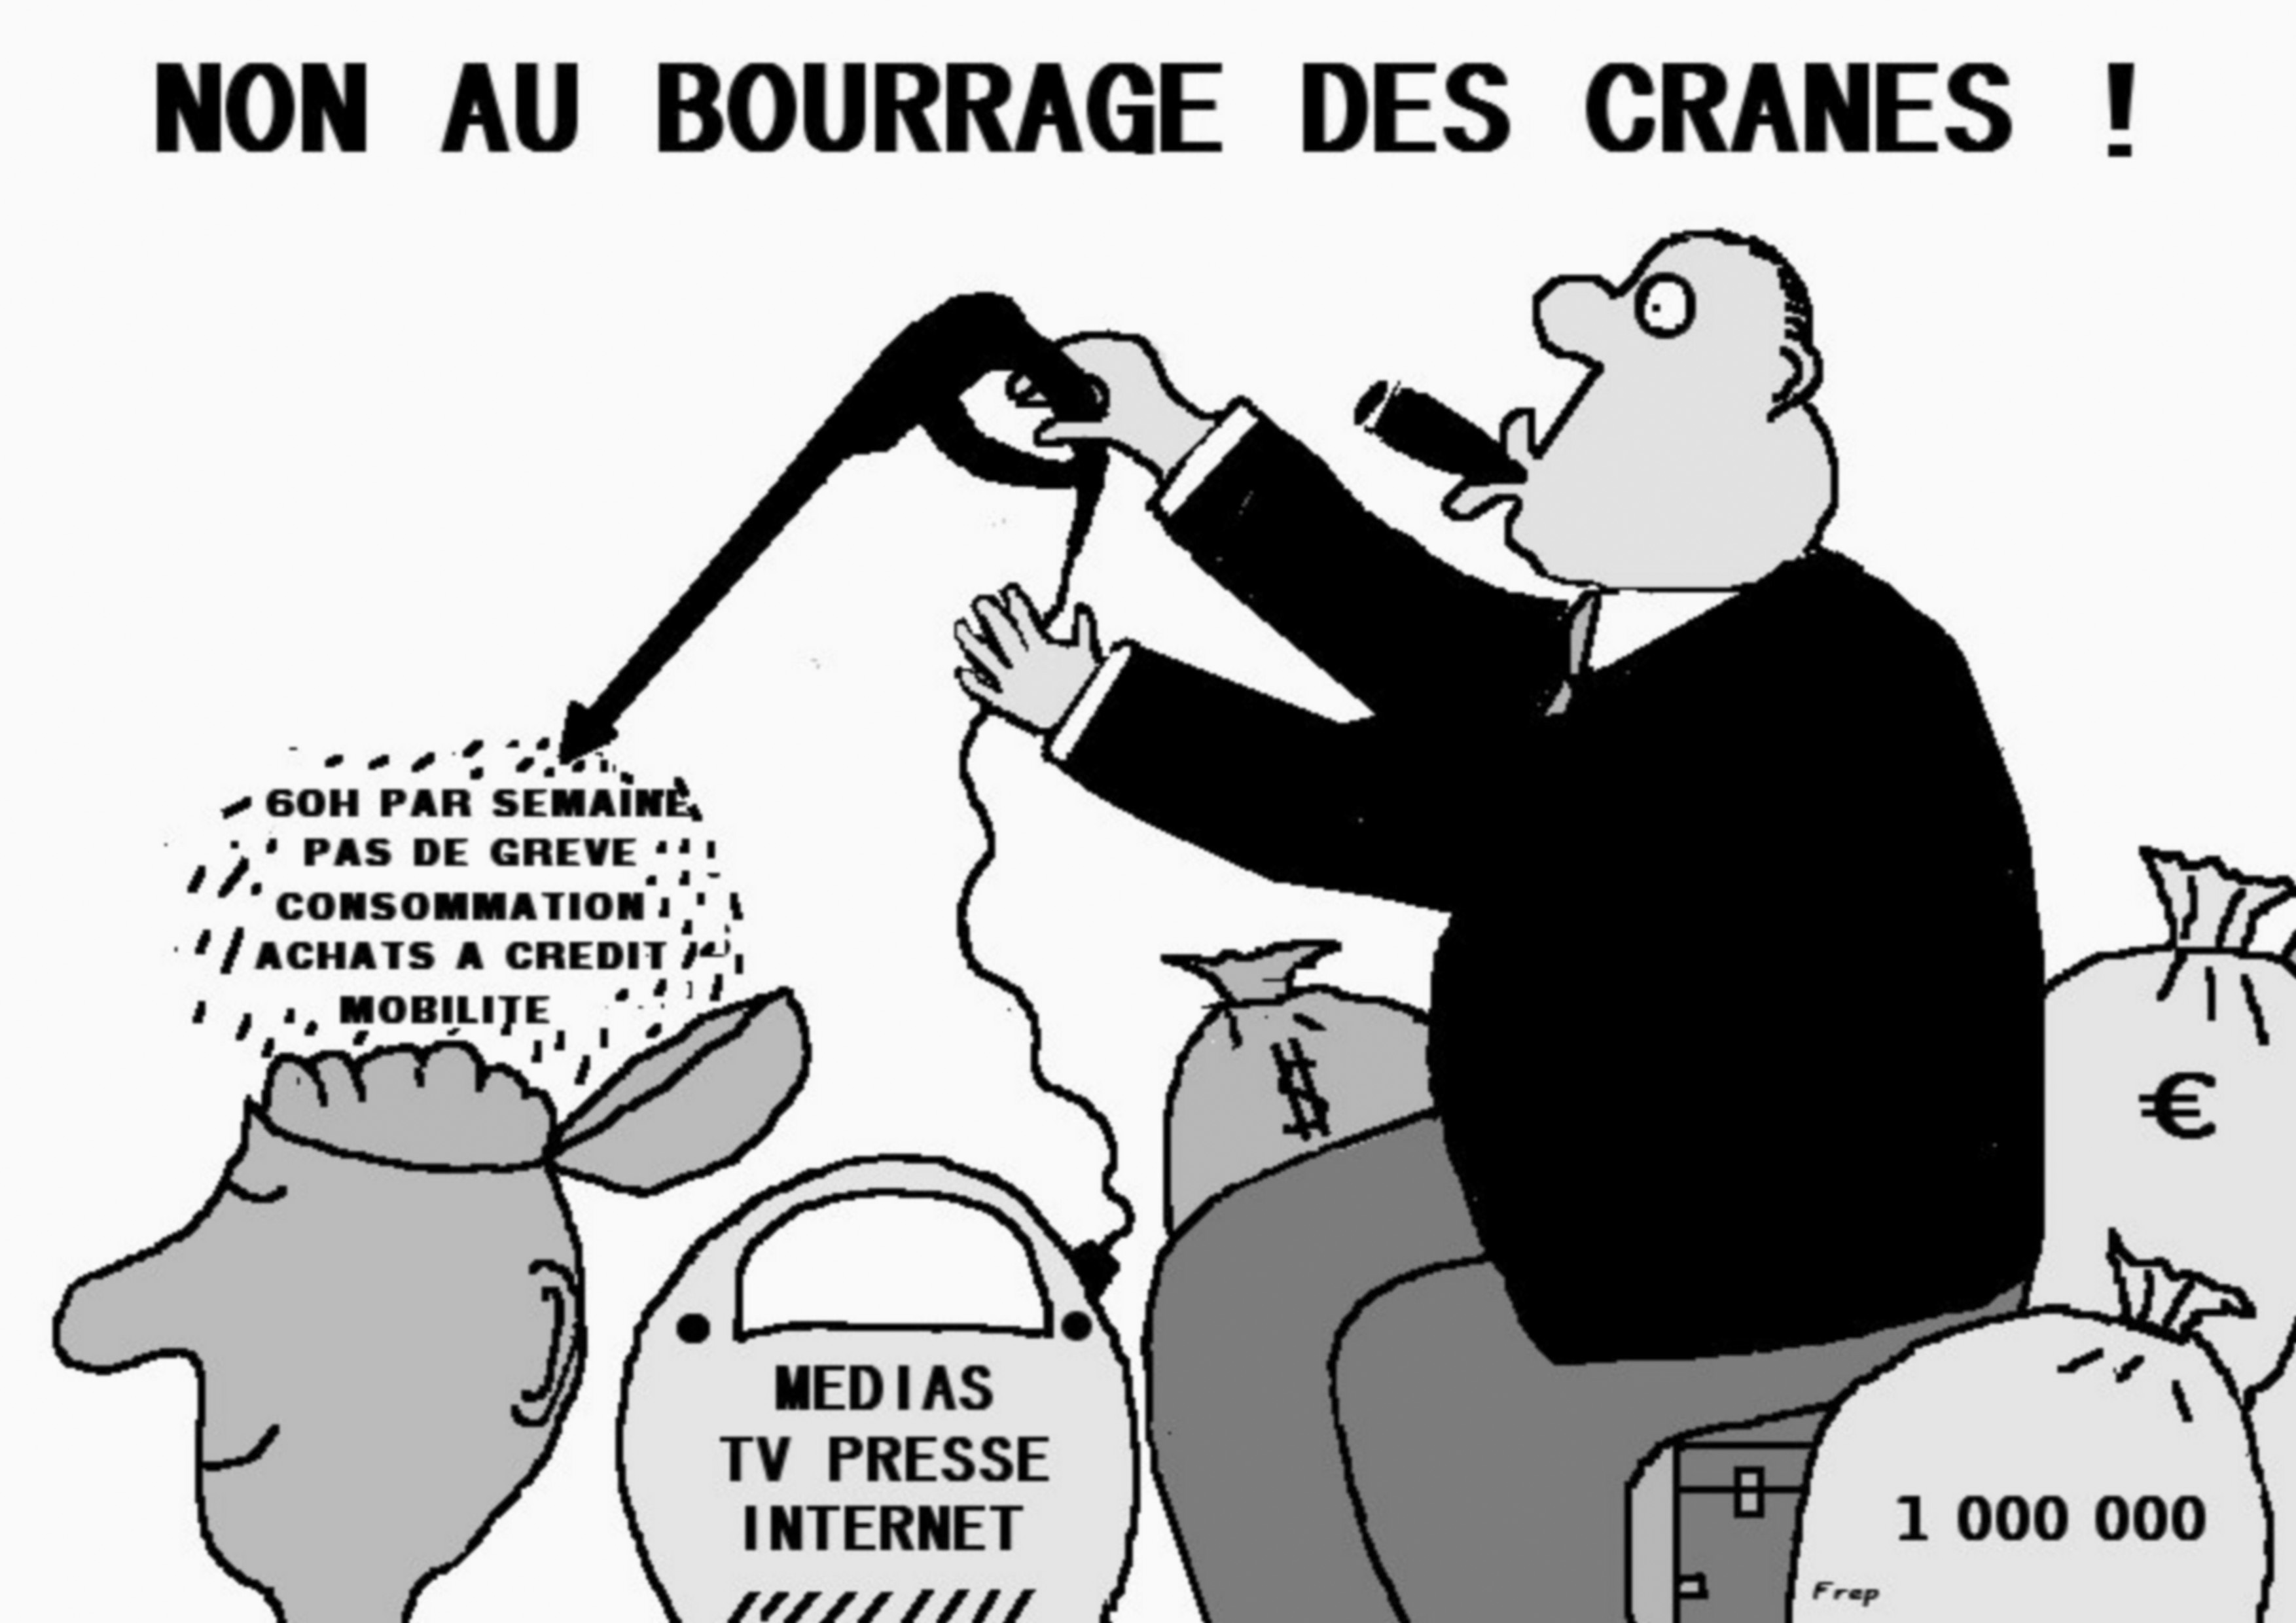 bourragedescranes